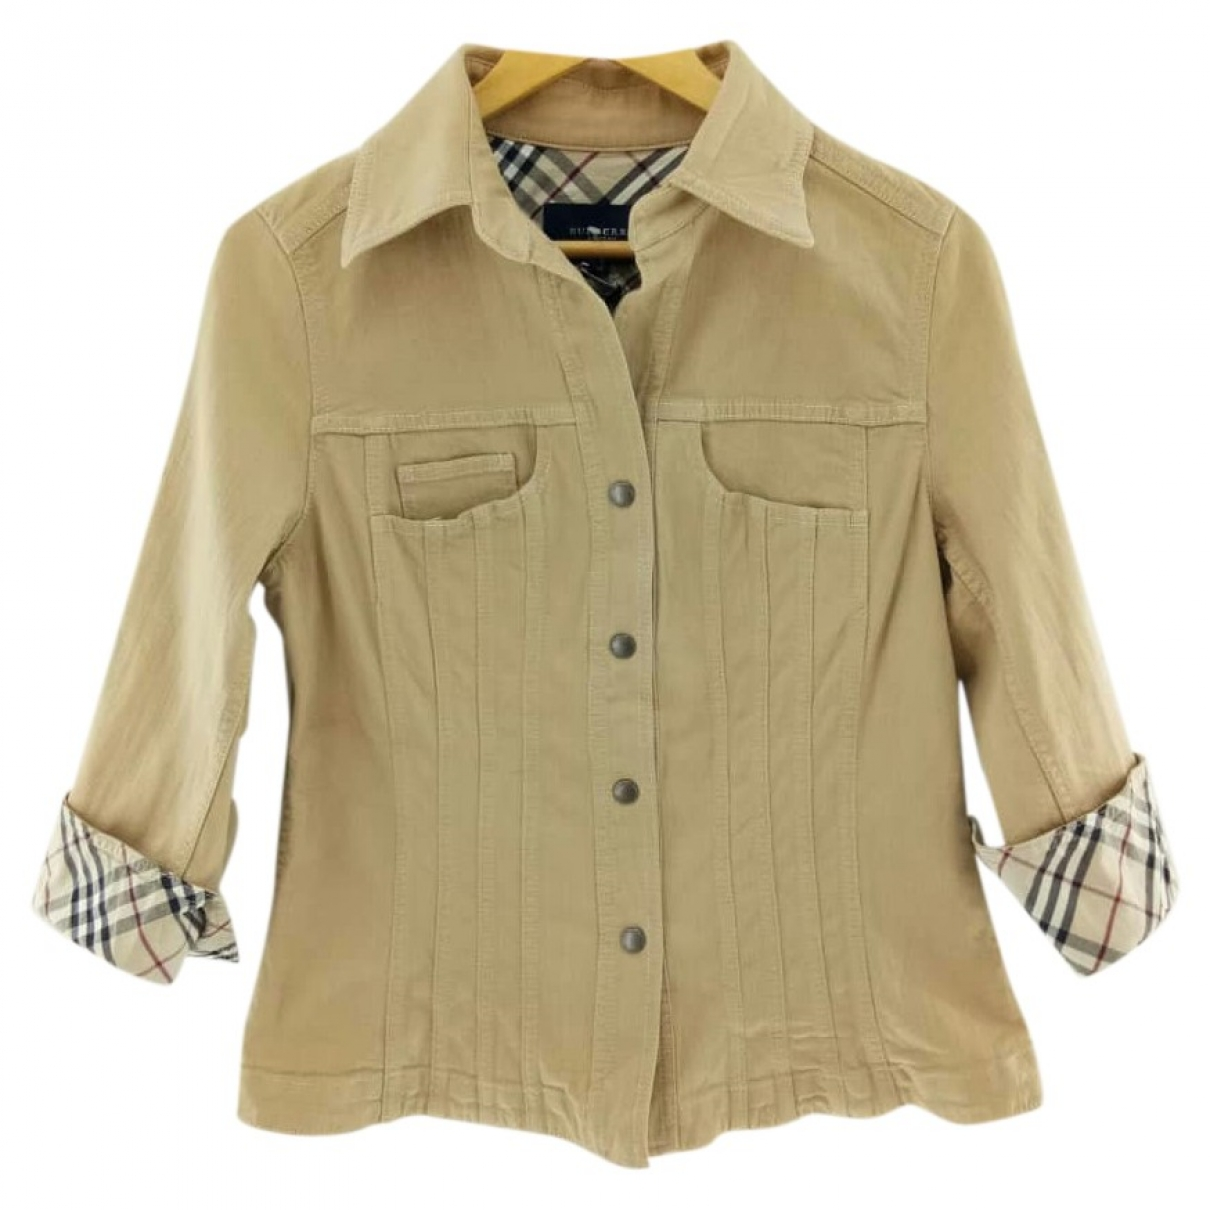 Burberry \N Beige Denim - Jeans jacket for Women M International